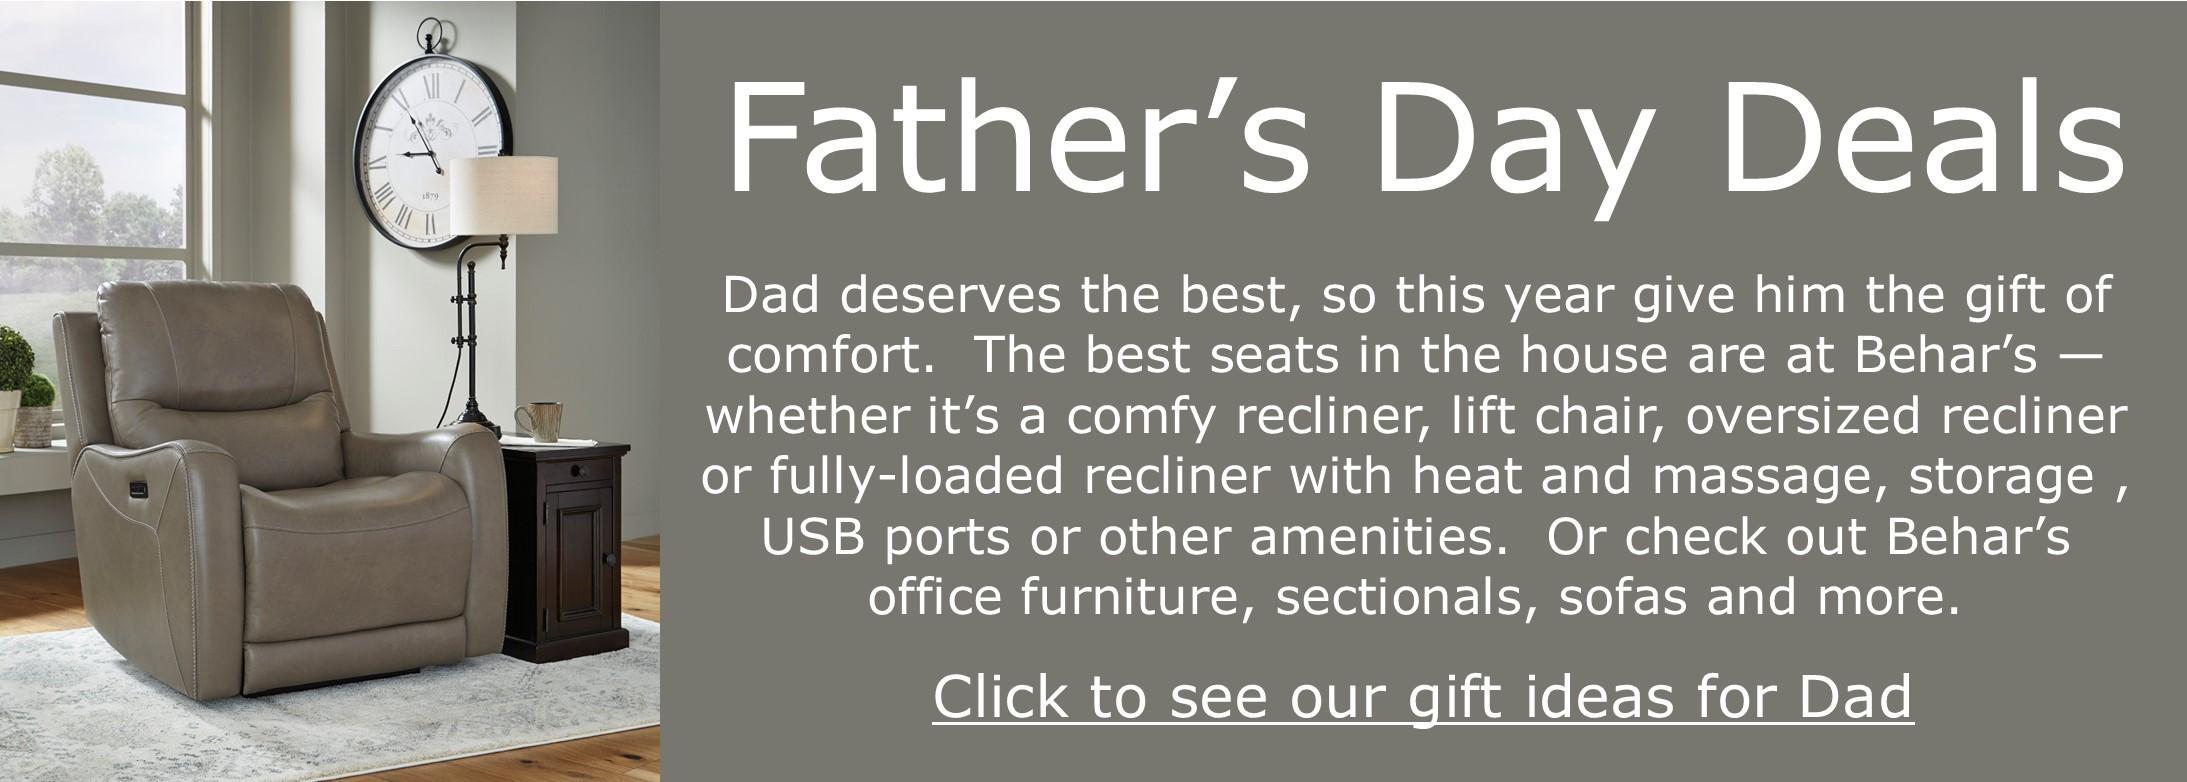 BEHAR'S GIFT IDEAS FOR DAD